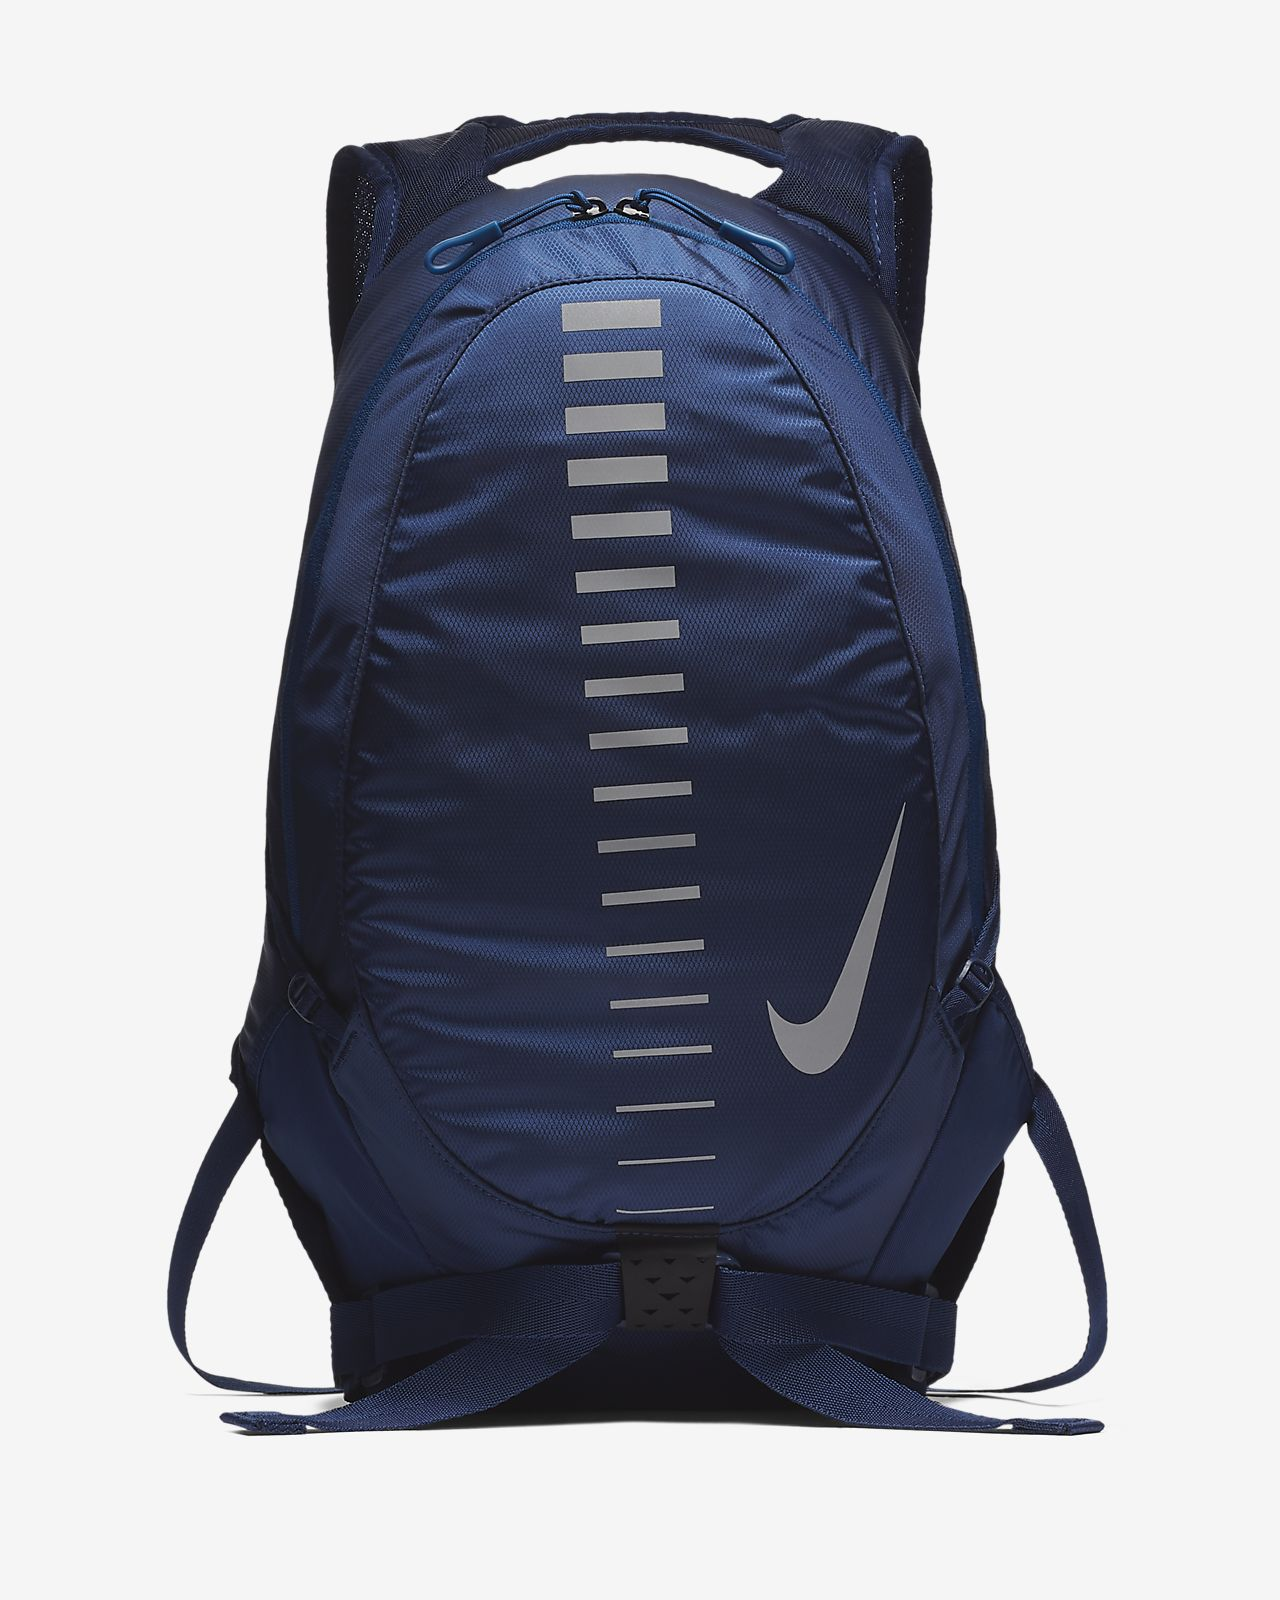 59b93feb0 Low Resolution Nike Commuter Running Backpack Nike Commuter Running Backpack